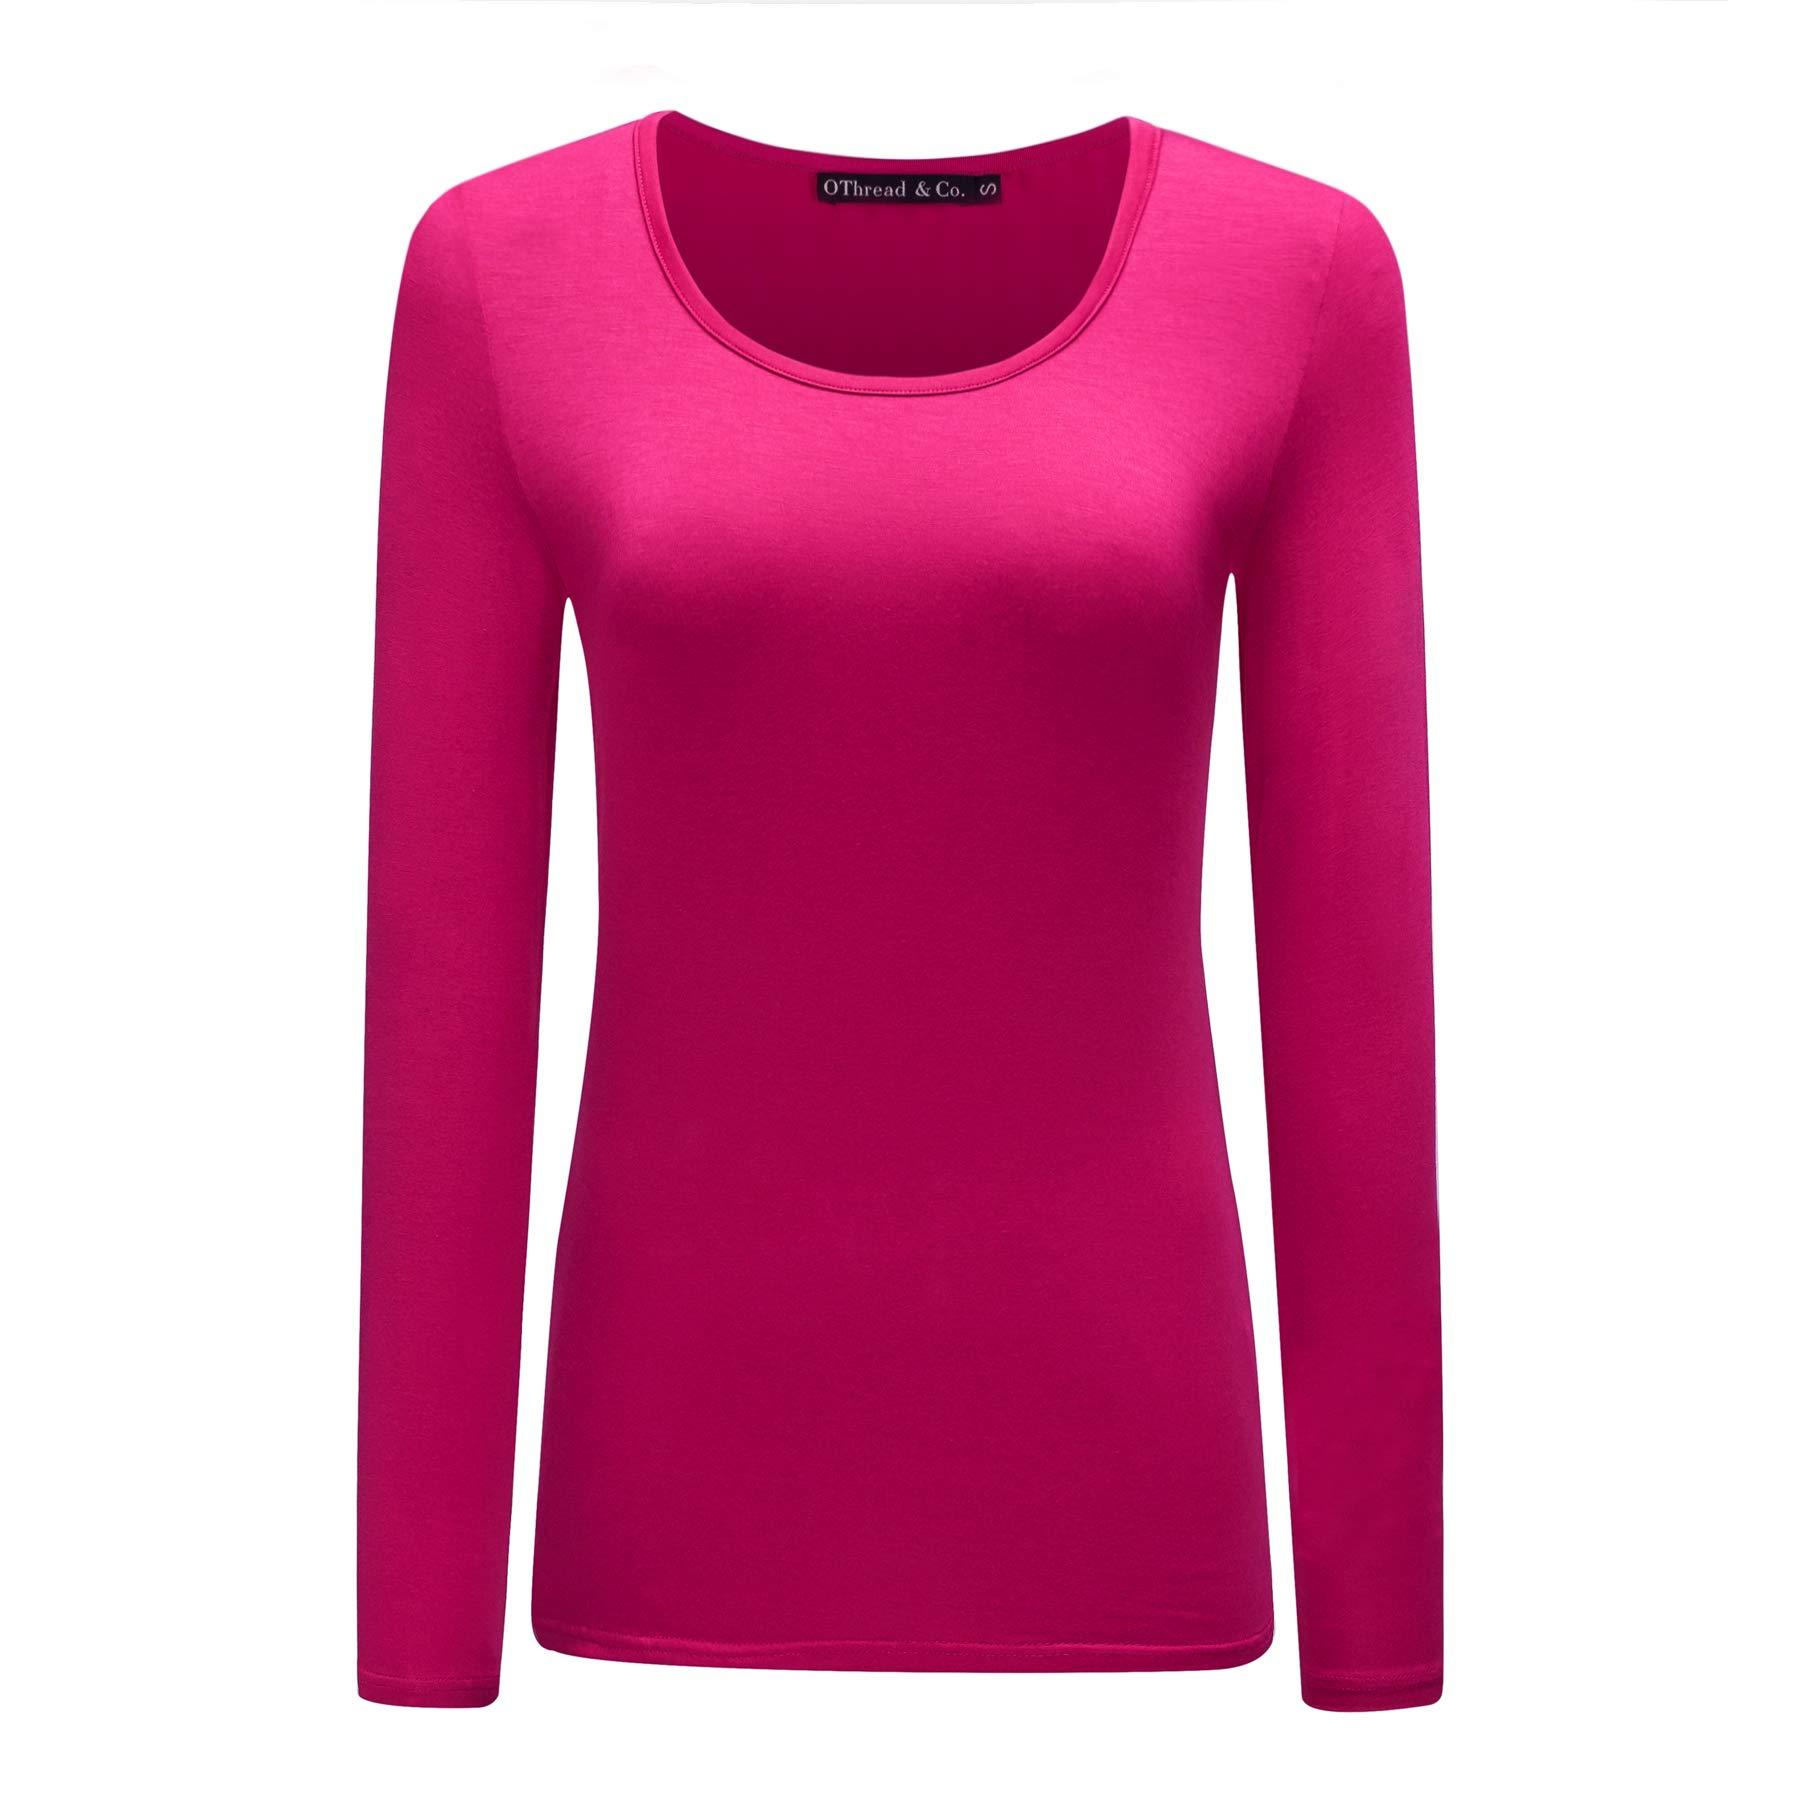 OThread & Co. Women's Long Sleeves T-Shirt Scoop